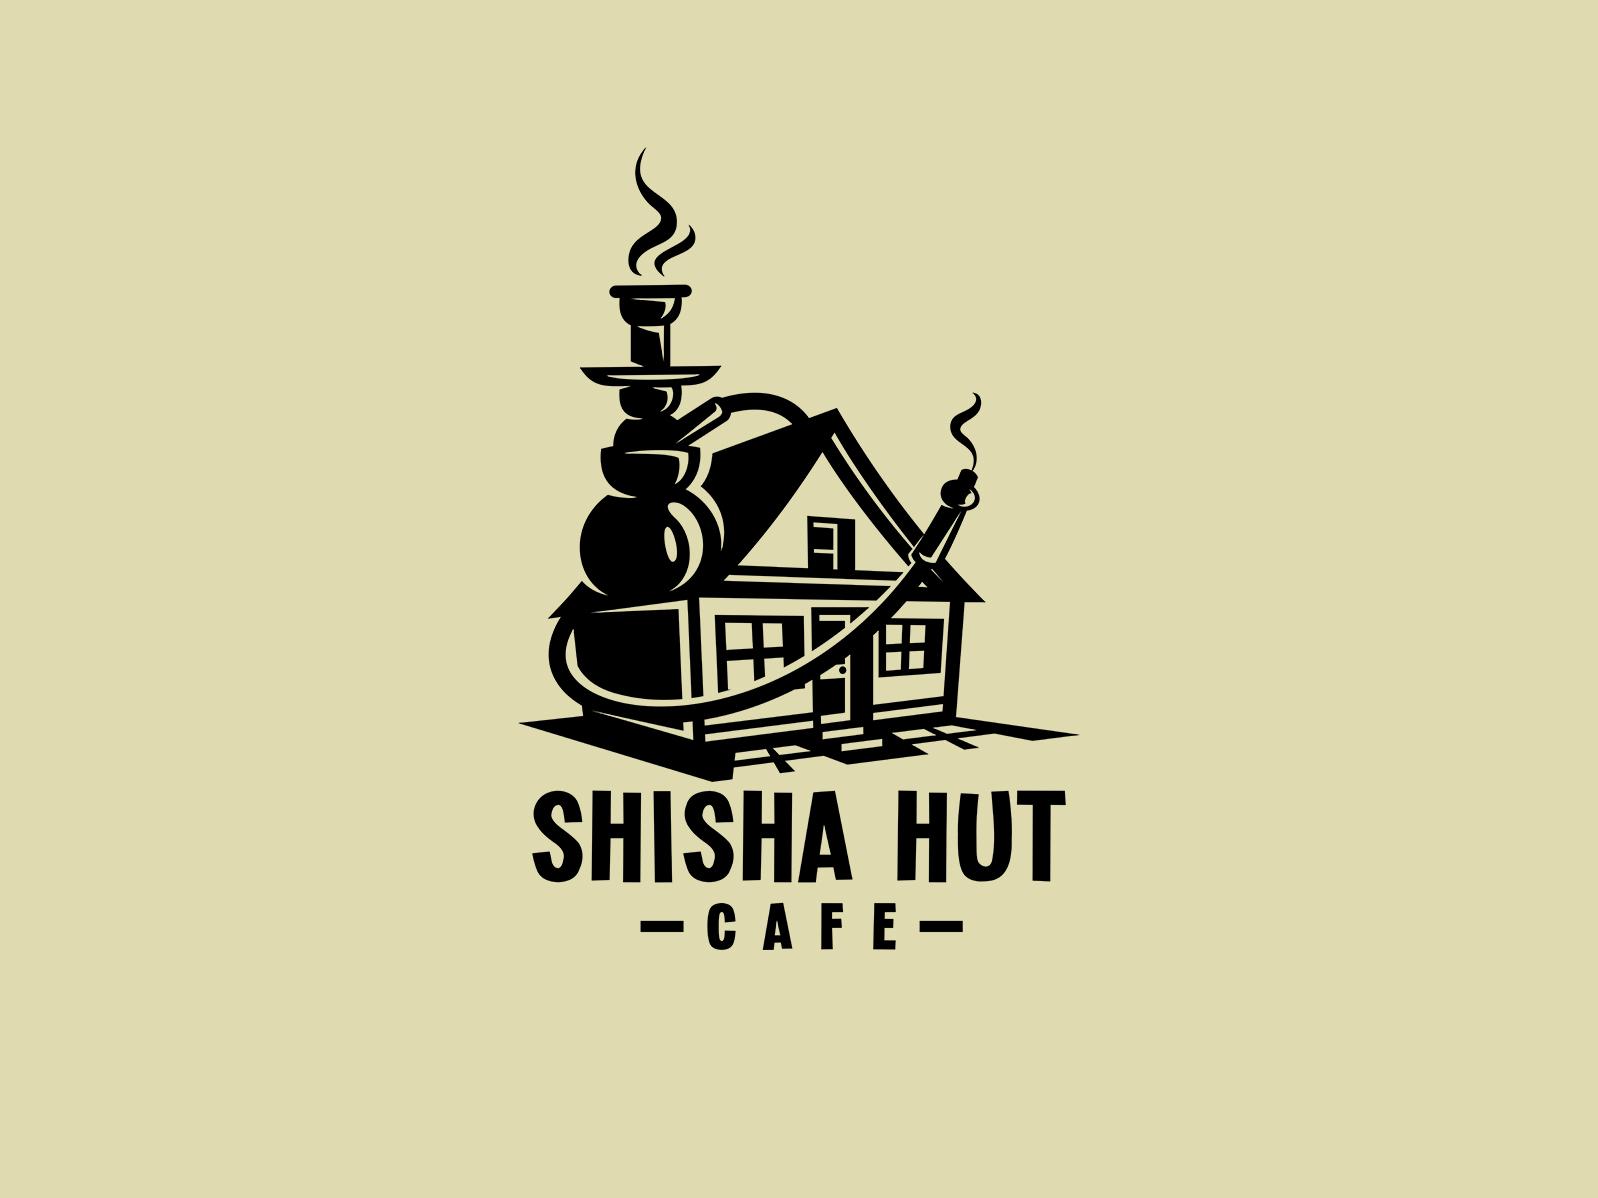 Shisha Hut dmitry krino logodesign logotype smoke home house shisha cafe hut hookah logo